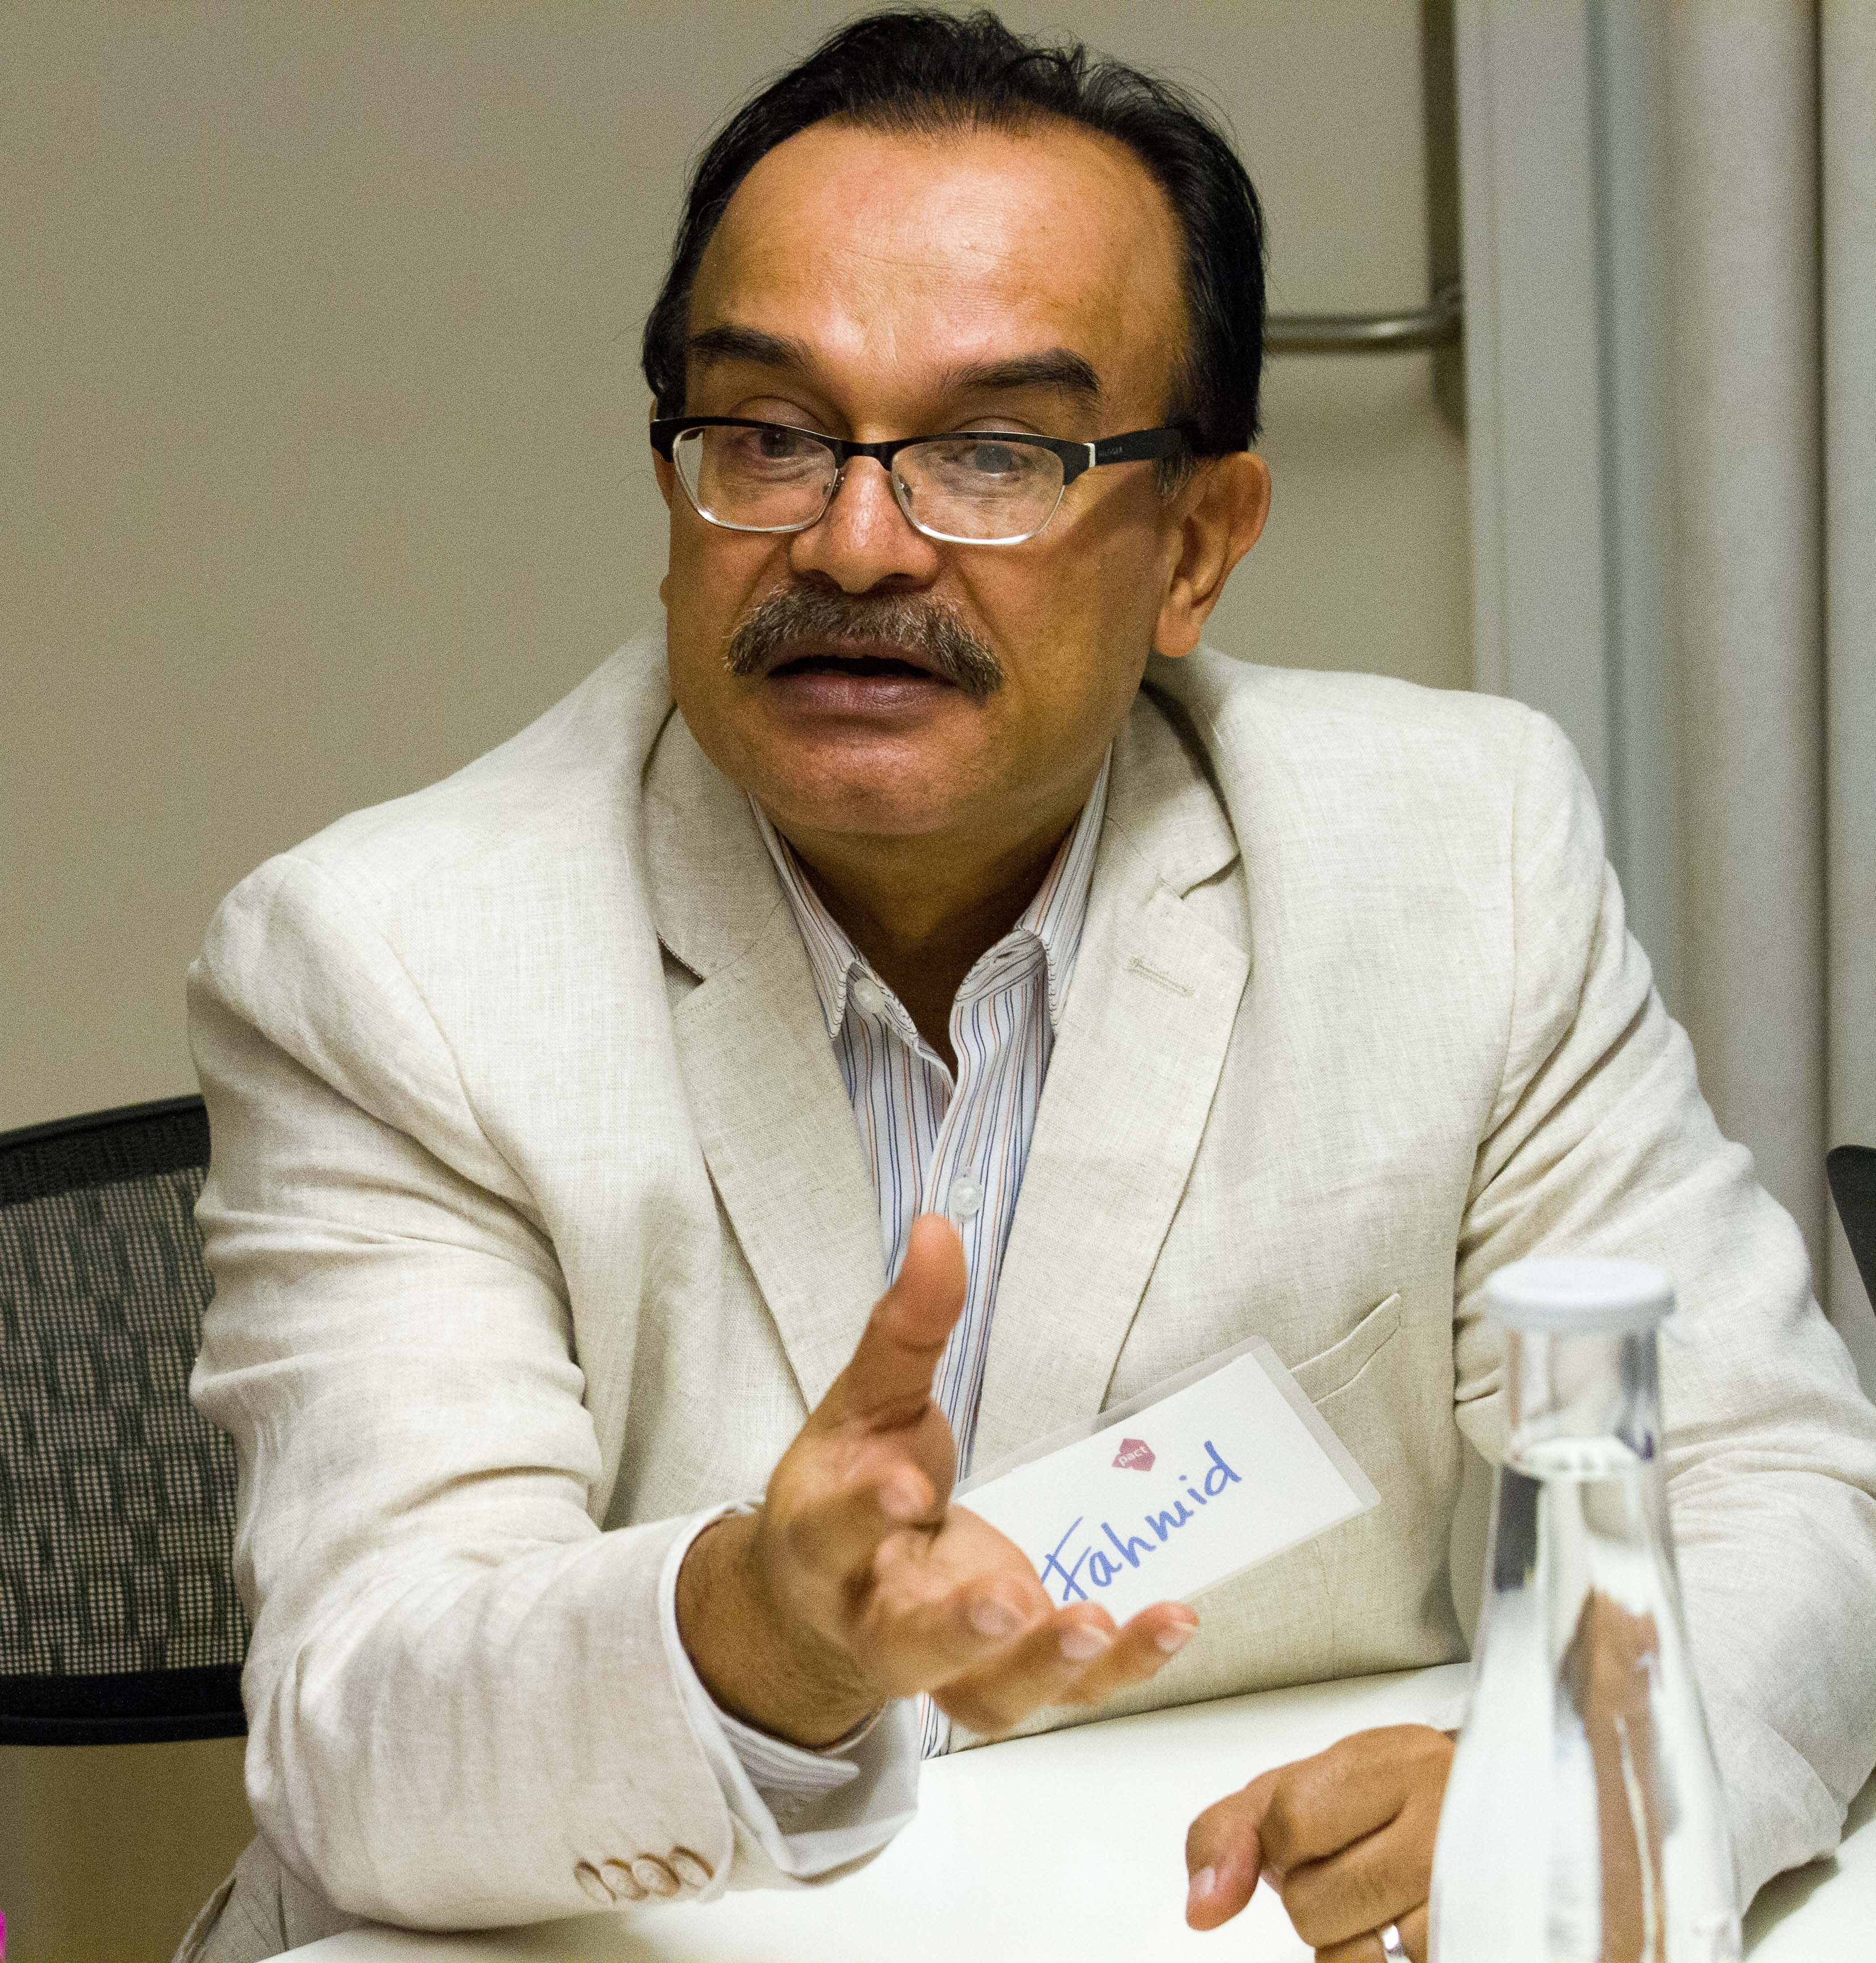 Fahmid Bhuiya